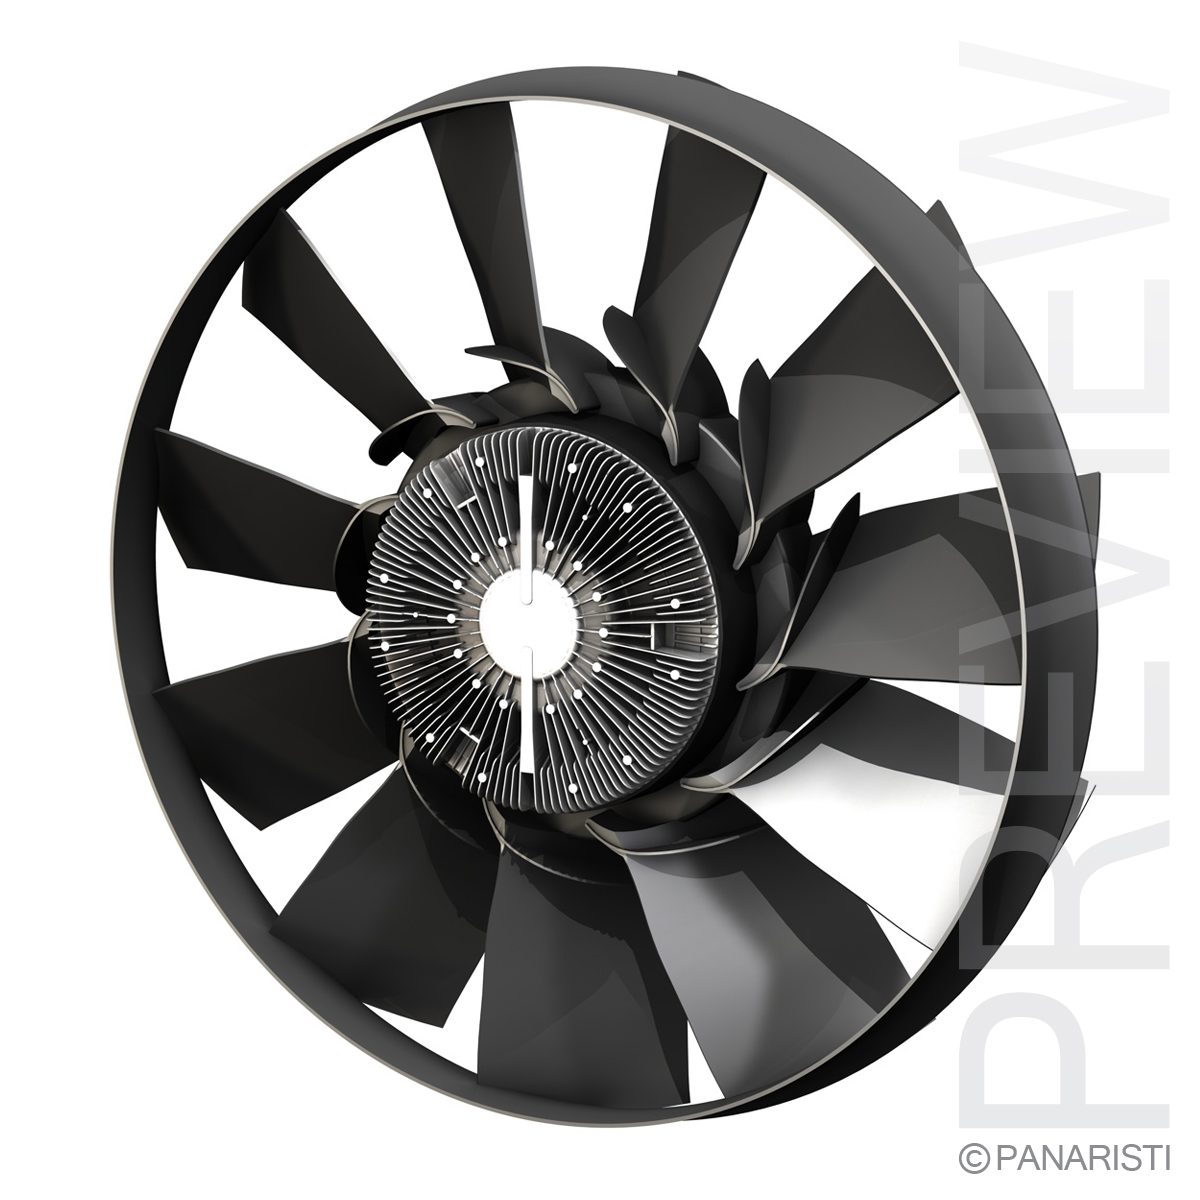 Engine cooling fan 2 3d model 3ds c4d lwo lws lw obj 129277